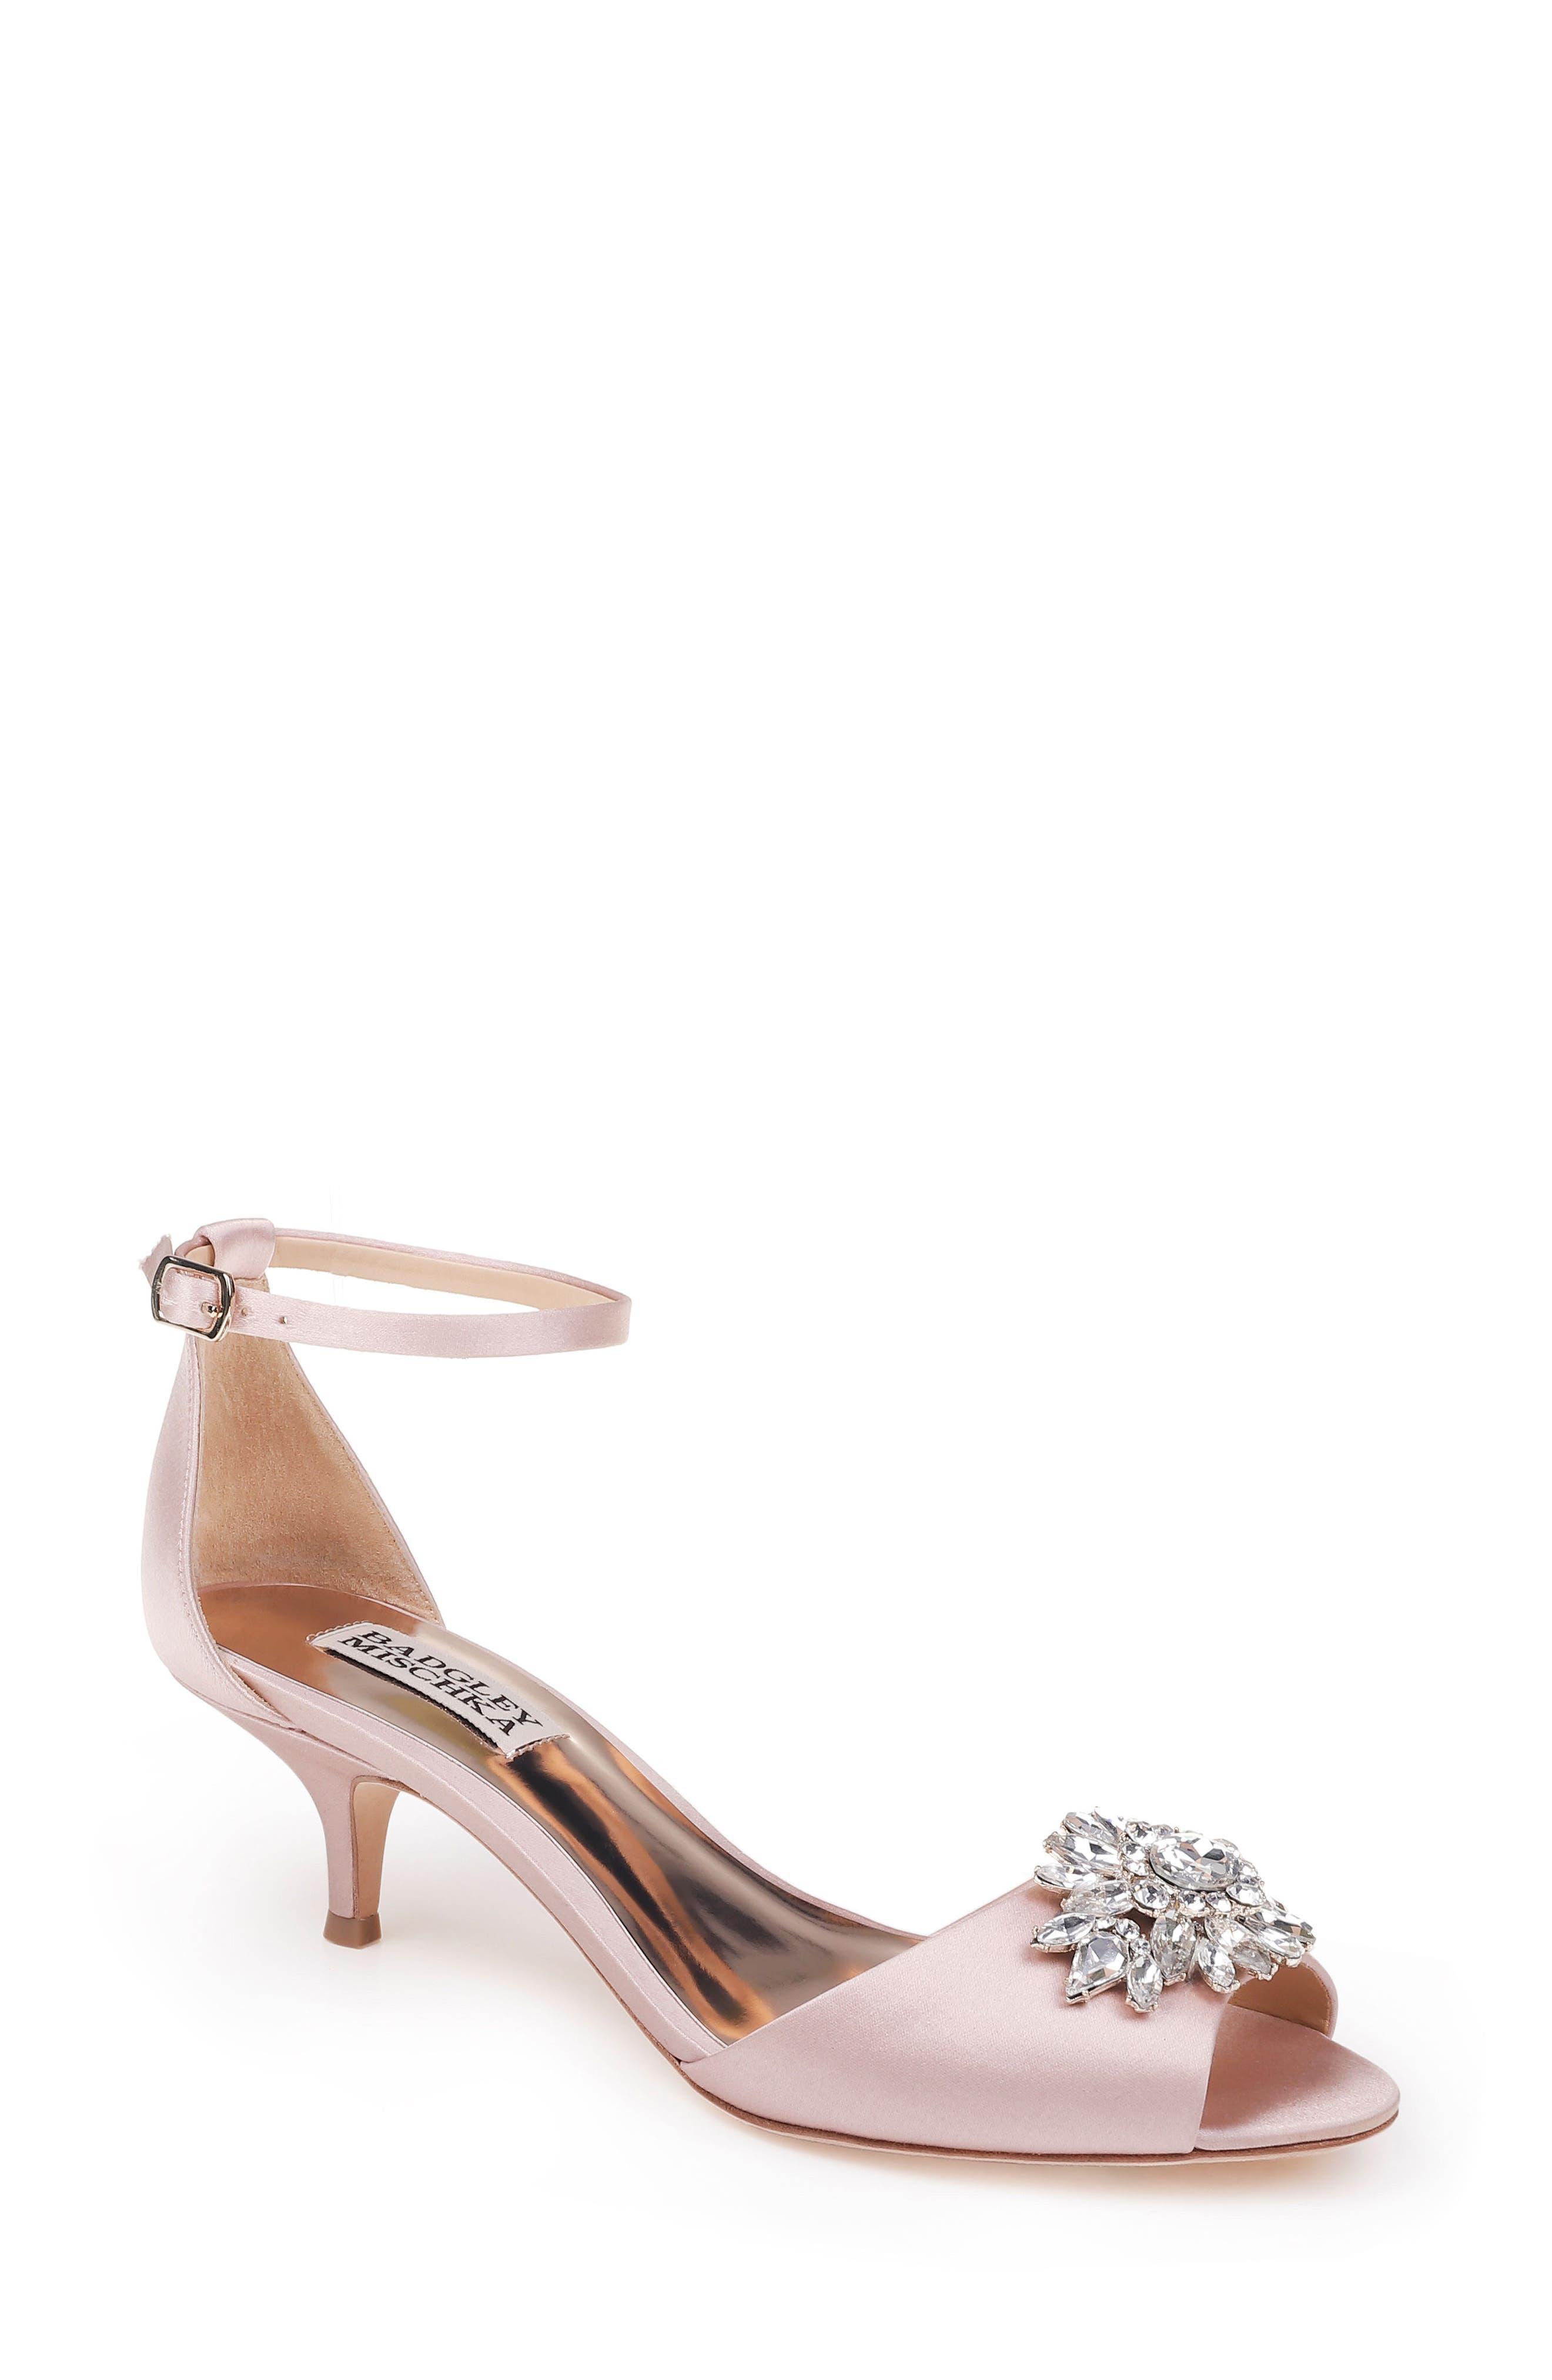 Alternate Image 1 Selected - Badgley Mischka Sainte Crystal Embellished Sandal (Women)